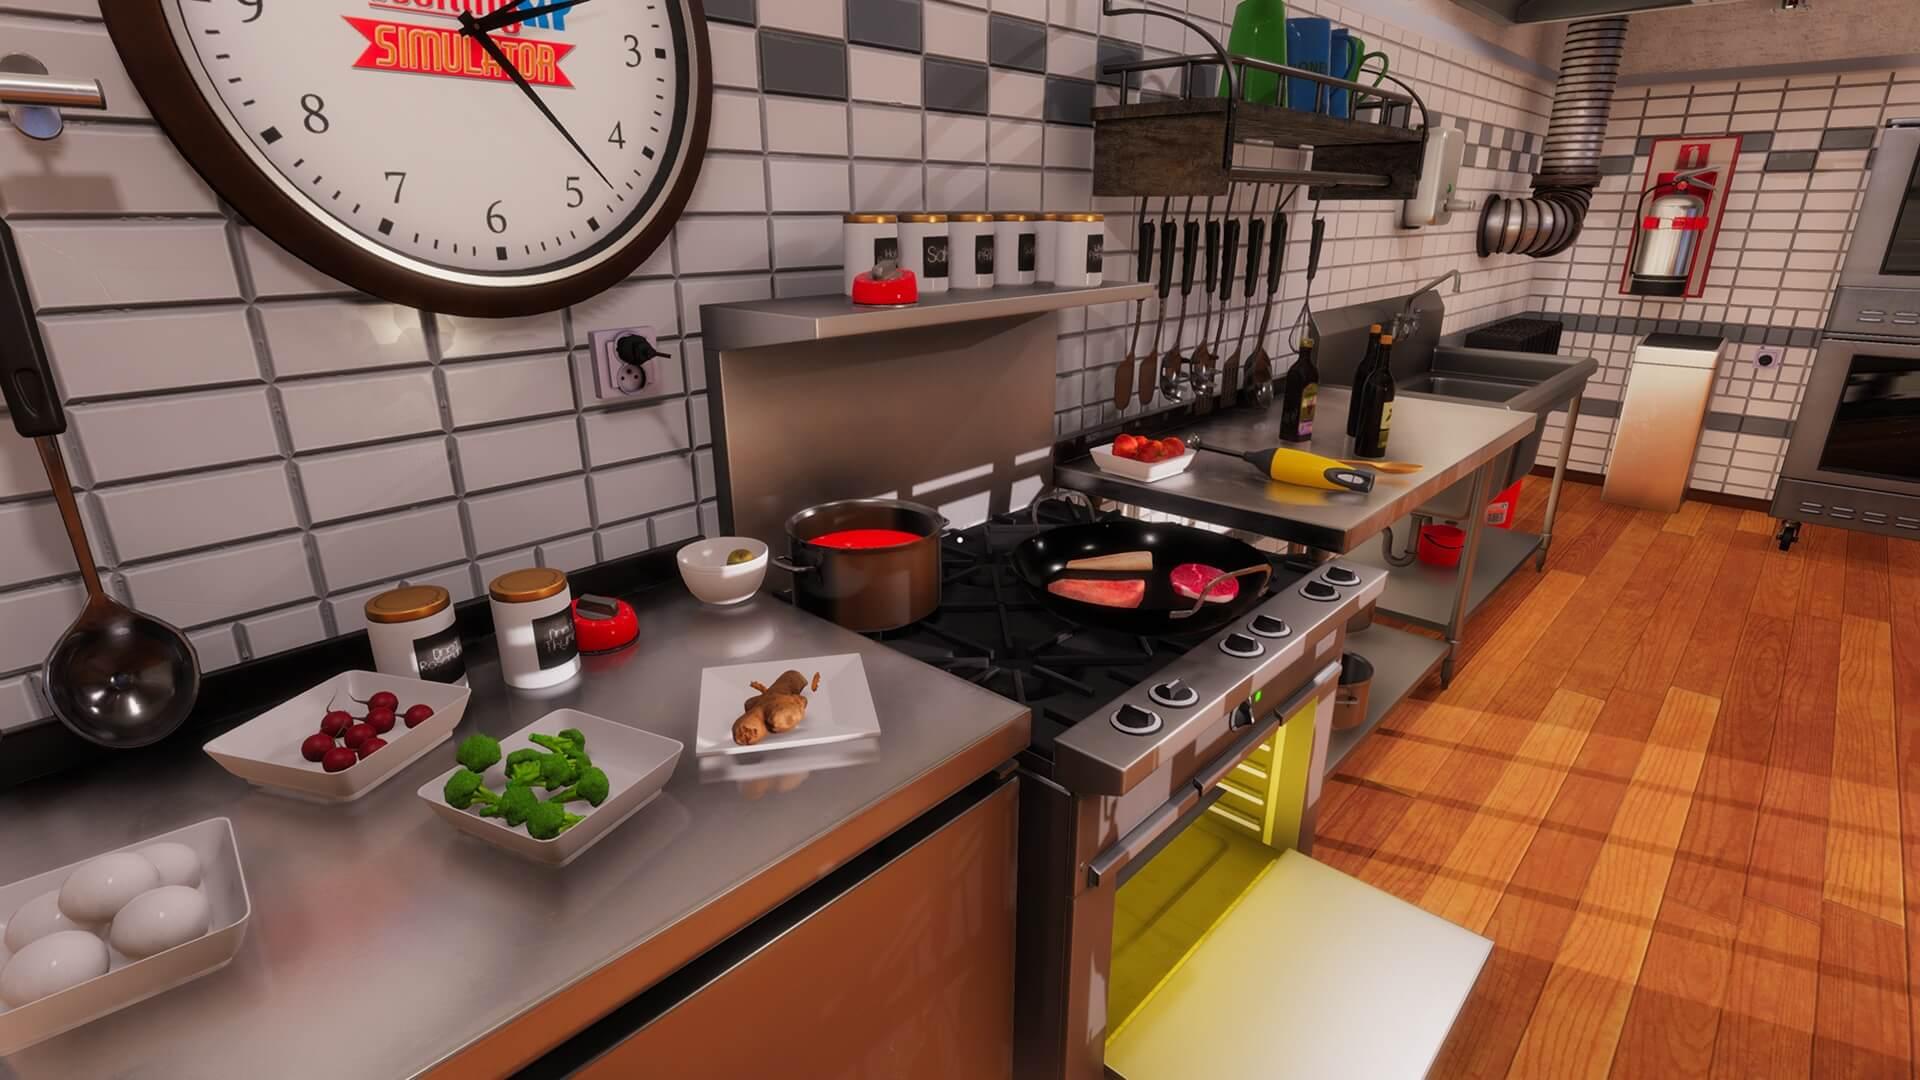 Cooking Simulator download free